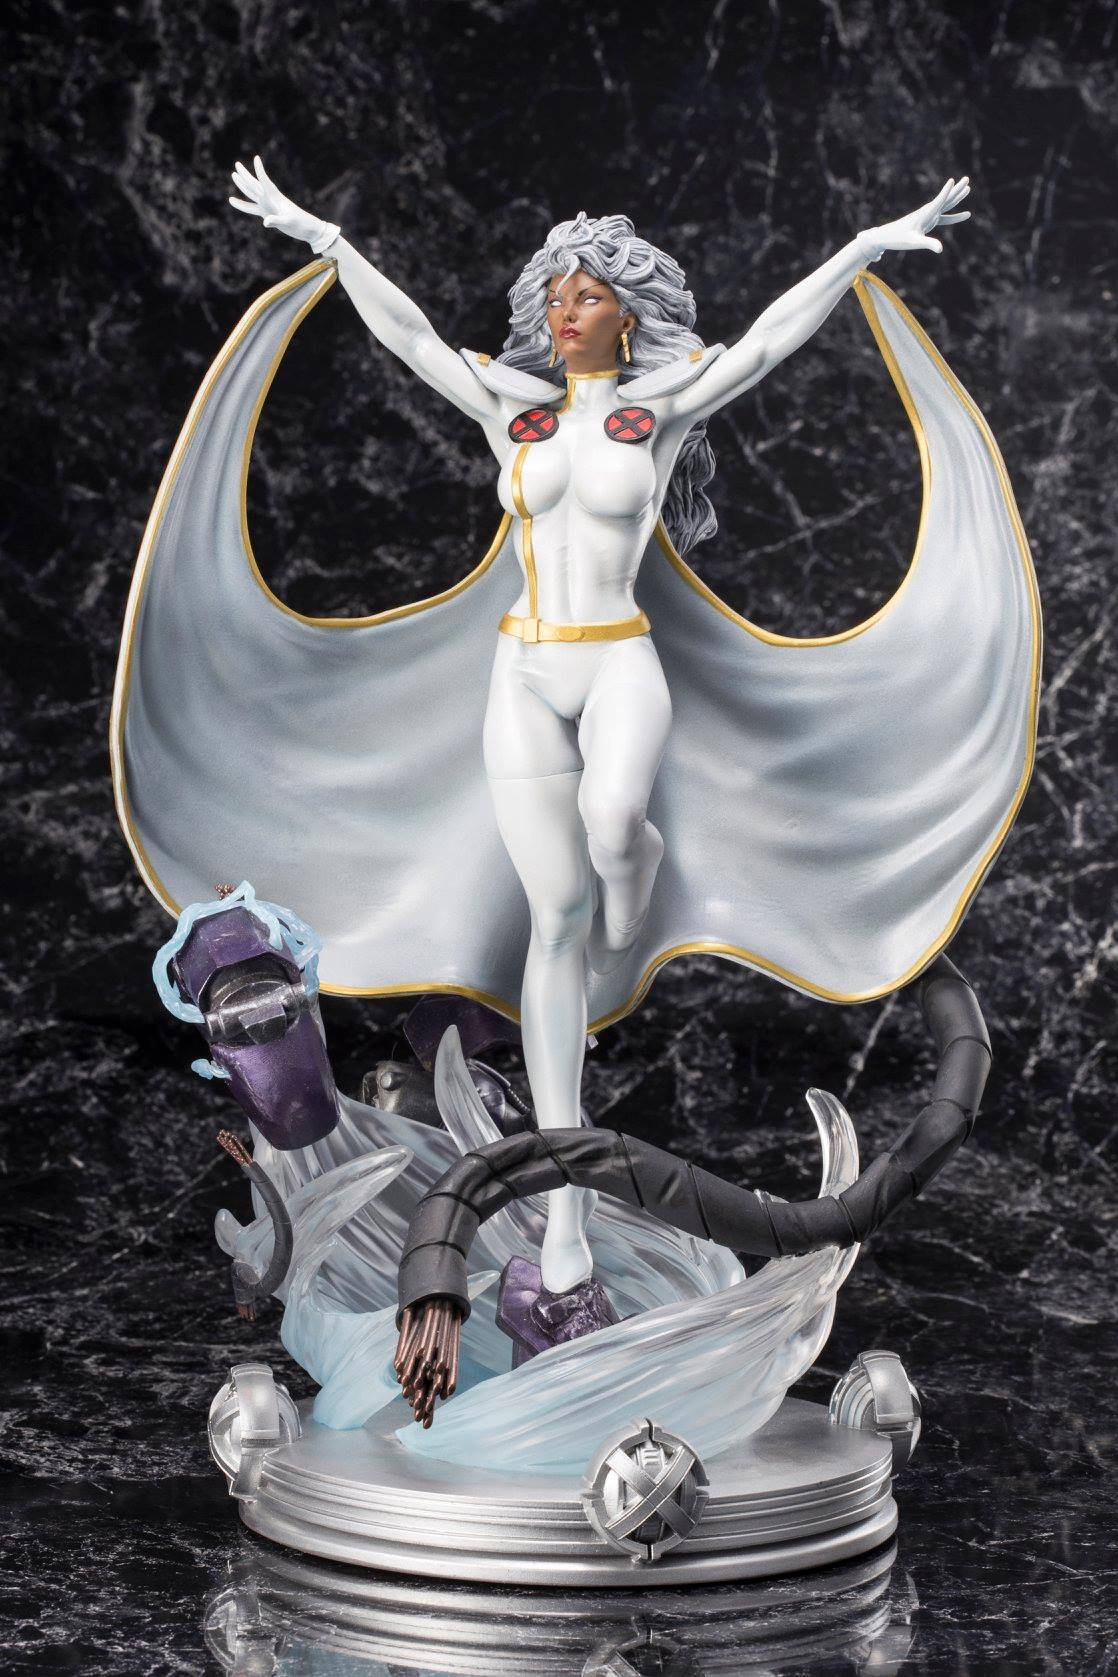 Kotobukiya Storm X Men Danger Room Sessions Statue Up For